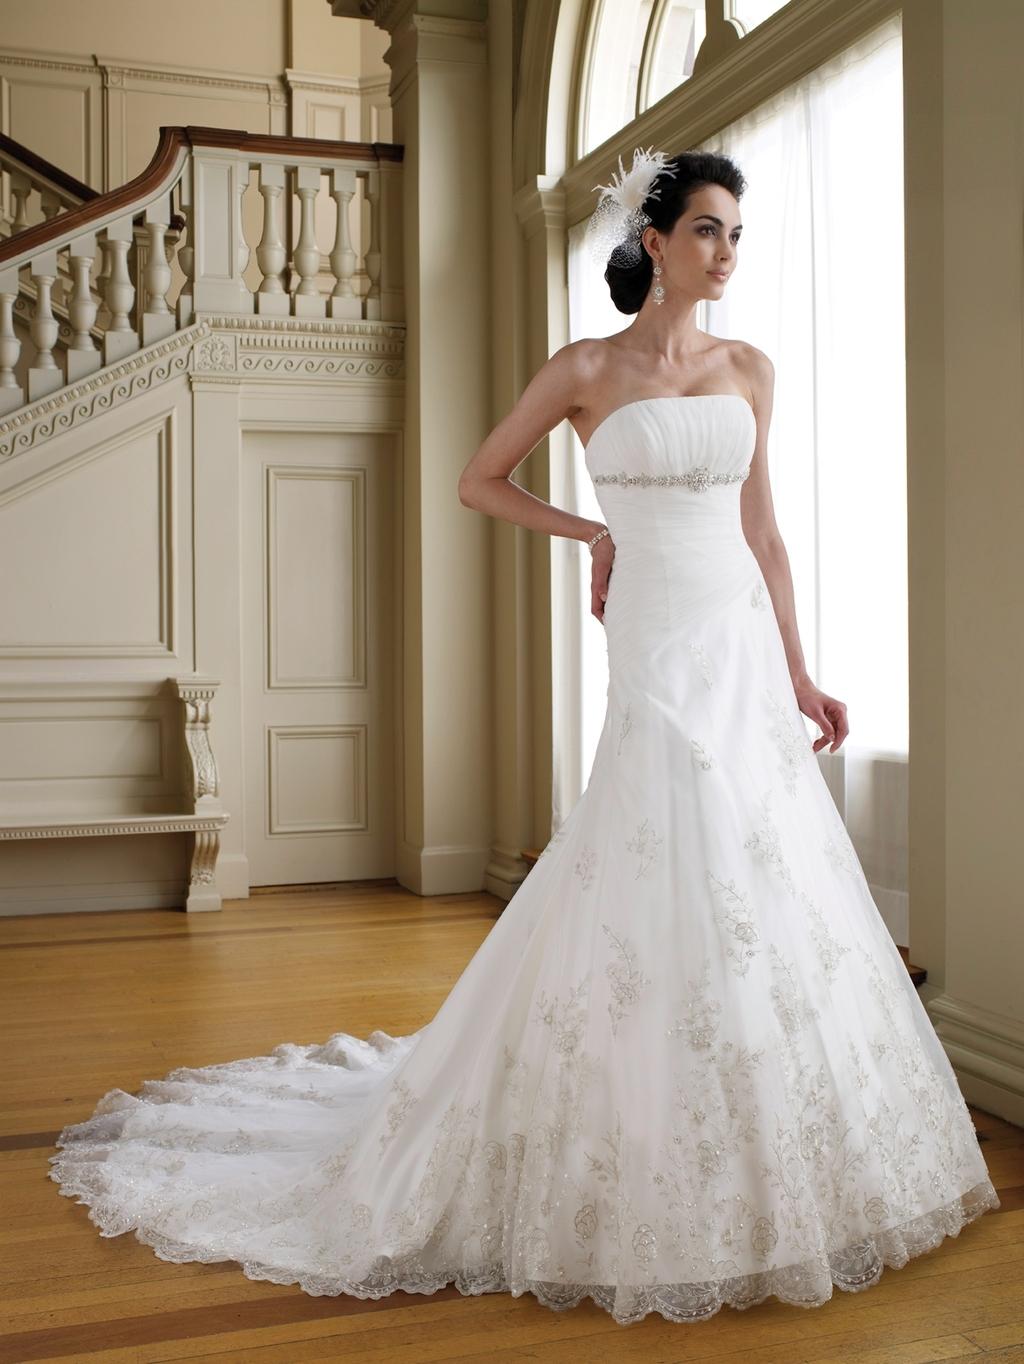 111204-018-mon-cheri-wedding-dress-2011-strapless-a-line-lace-applique.full